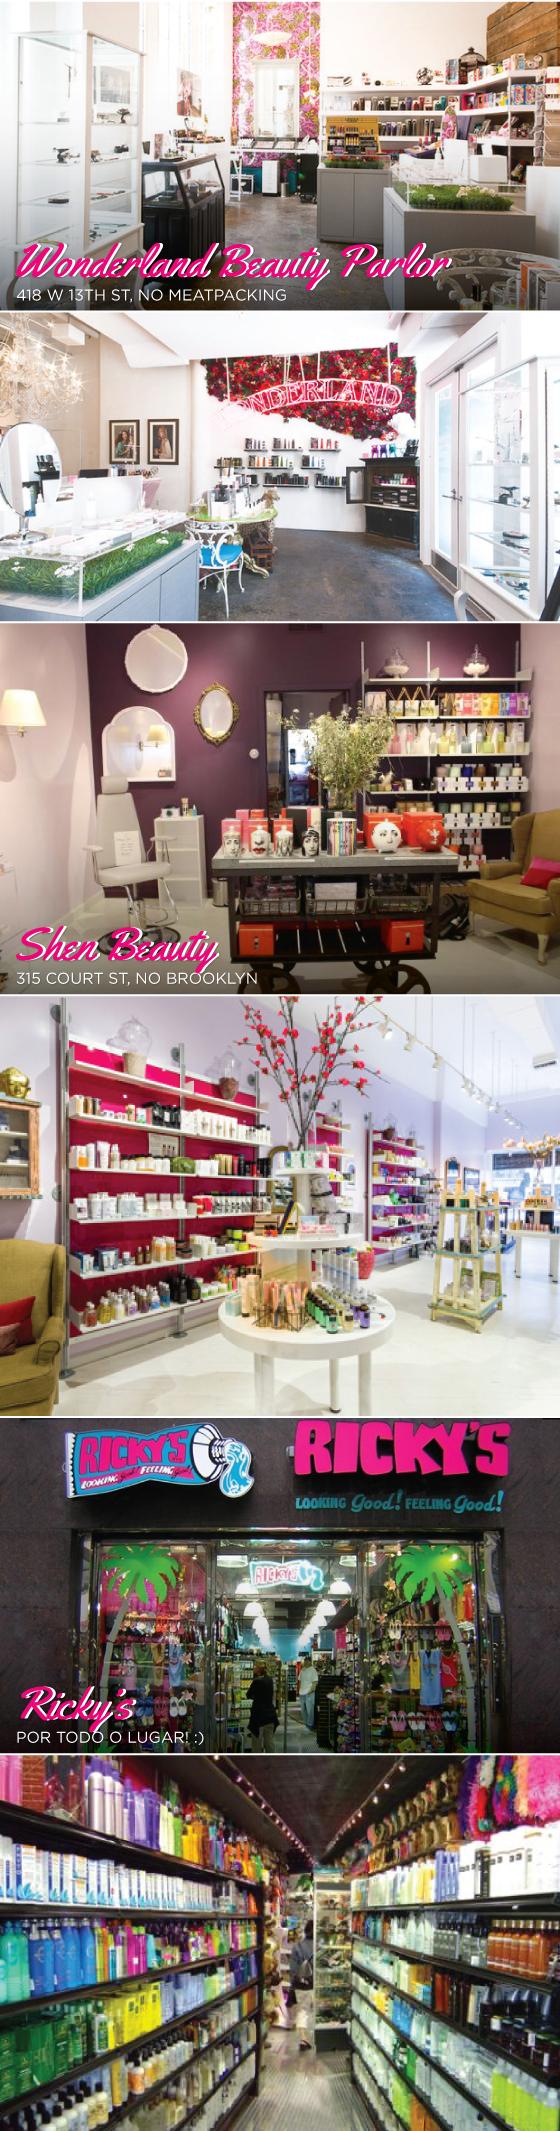 ny-farmacias-cosmeticos-maquiagem-lugar-diferente-dica-viagem-ny-nyc-travel-rickys.meatpacking-wonderland-beauty-parlor-brooklyn-organico-shen